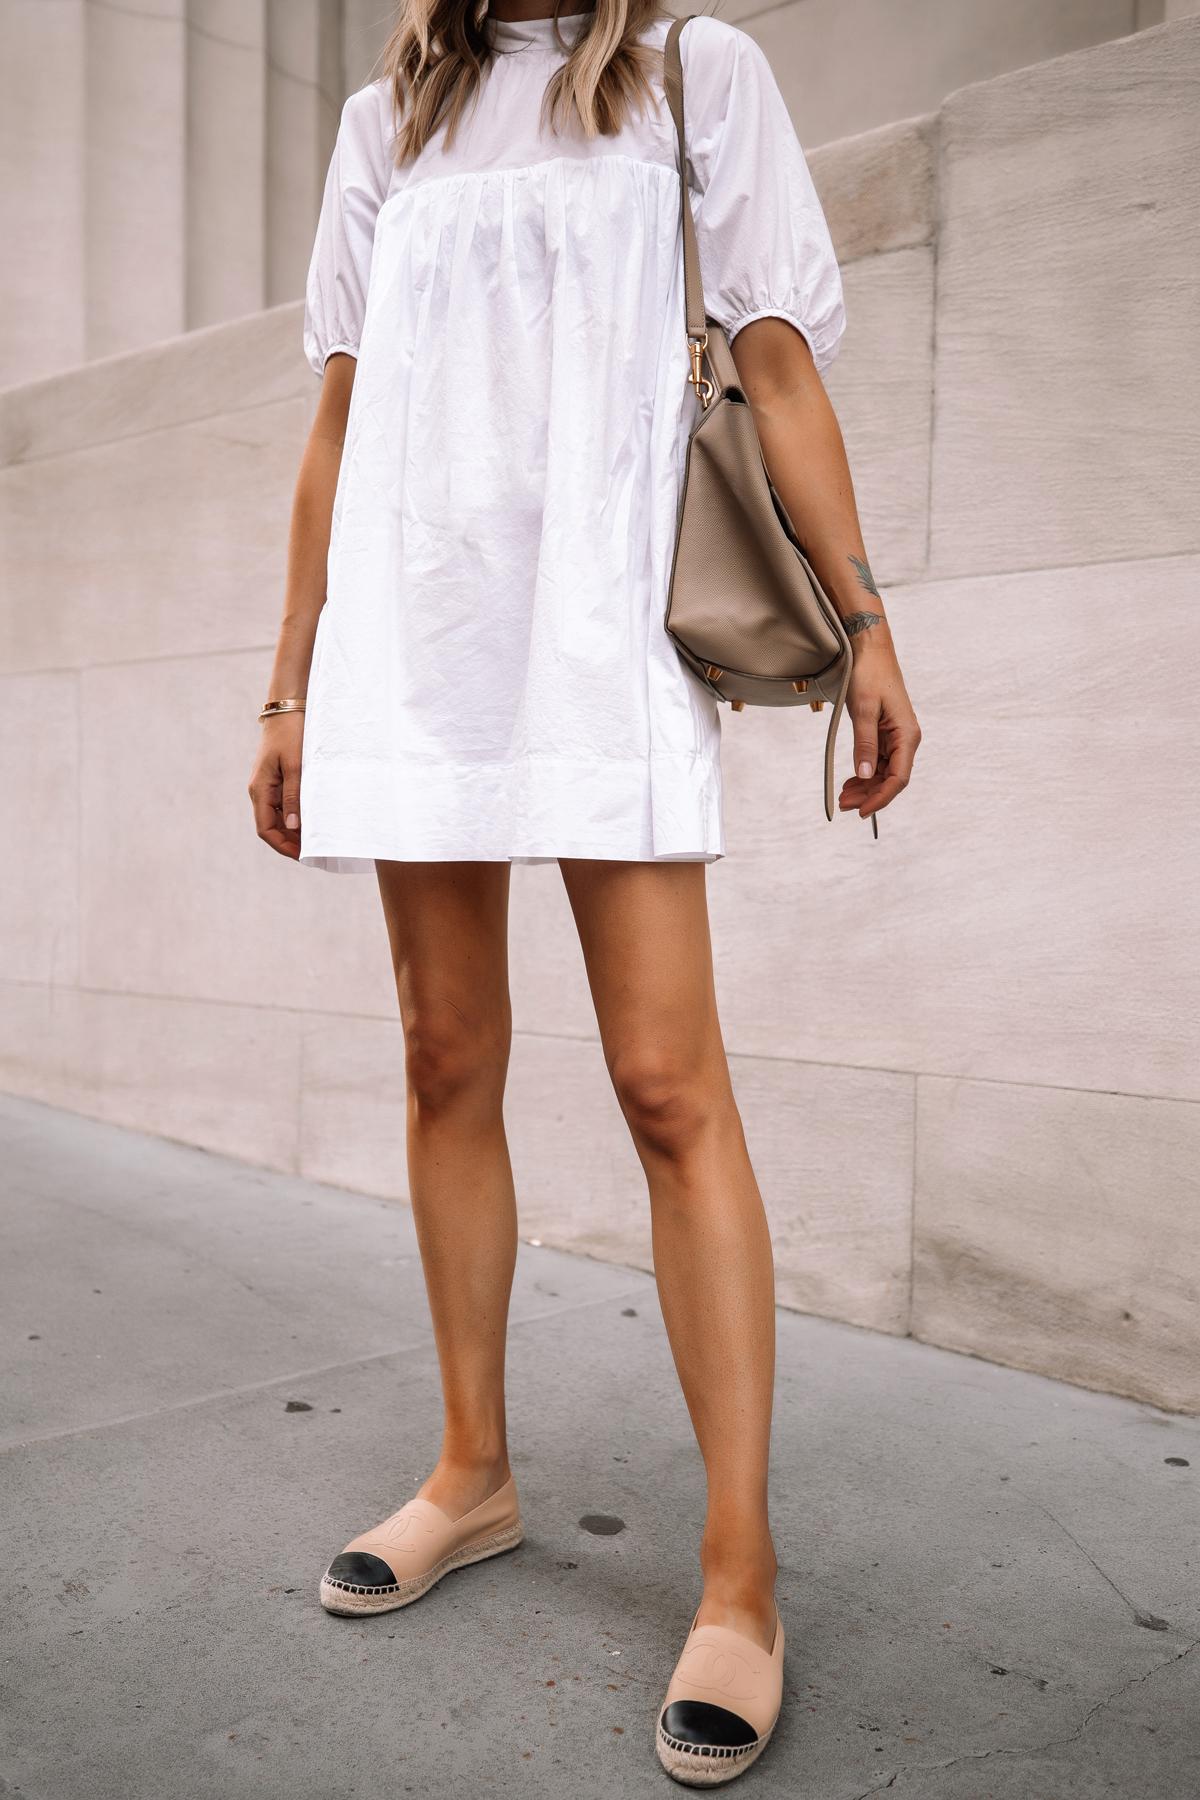 Fashion Jackson Wearing Everlane White Mini Dress Chanel Espadrilles Celine Mini Belt Bag